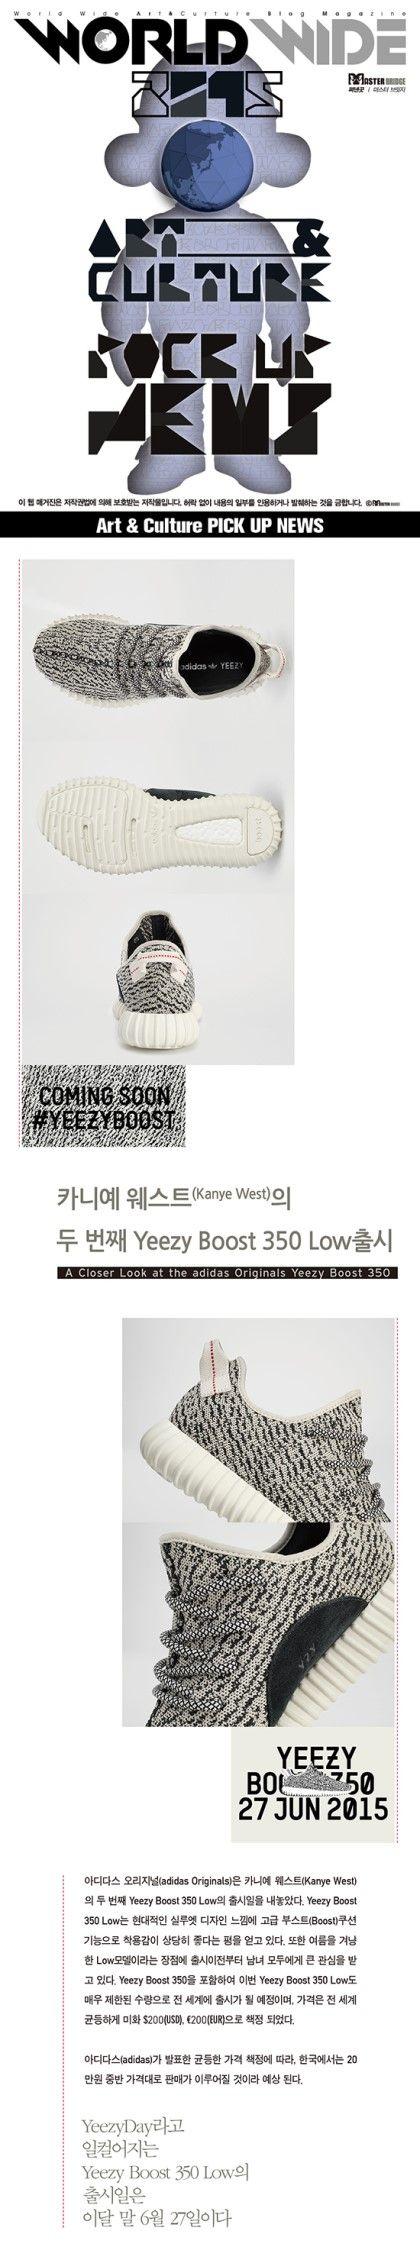 Blog Magazine ● WORLD WIDE: Art & Culture PICK UP NEWS∥카니예 웨스트(Kanye West)의 두 번째 Yeezy Boost 350 Low출시 : 네이버 블로그